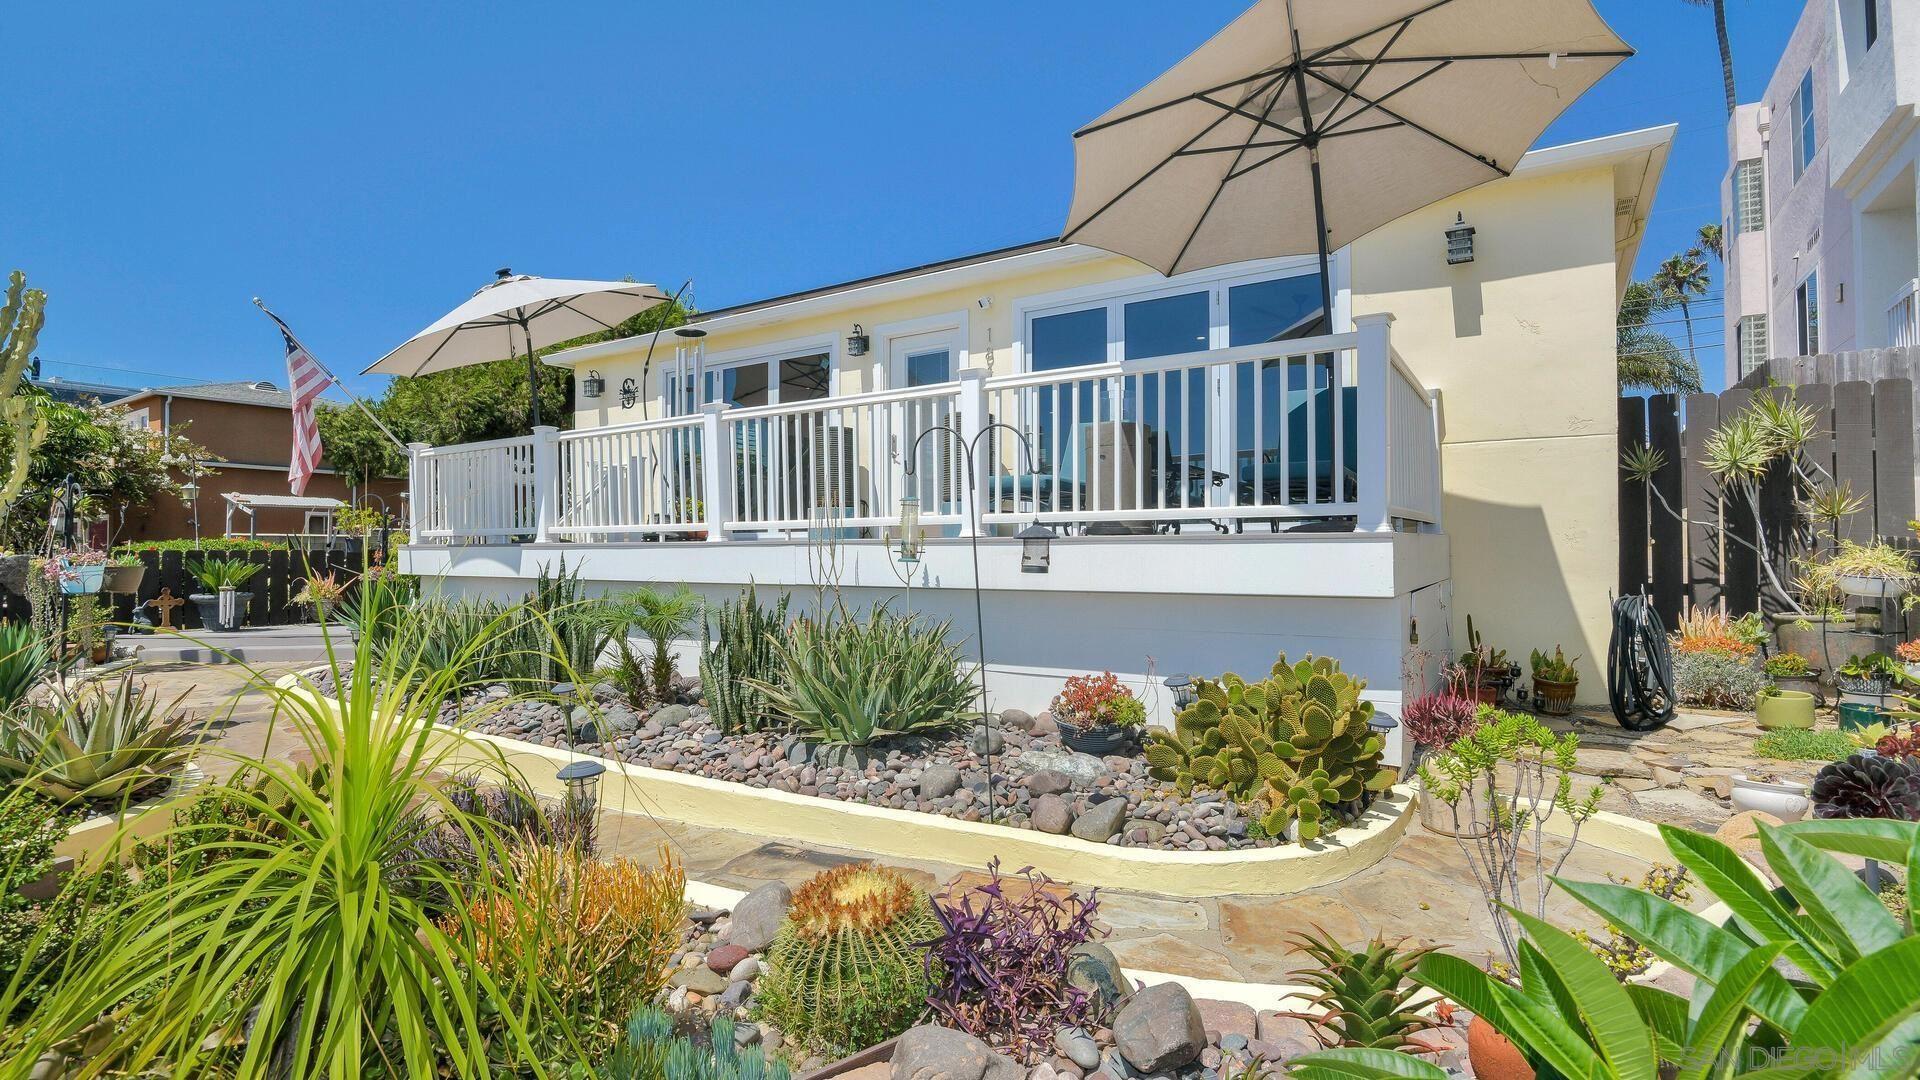 Photo for 184 Imperial Beach Blvd, Imperial Beach, CA 91932 (MLS # 210024606)